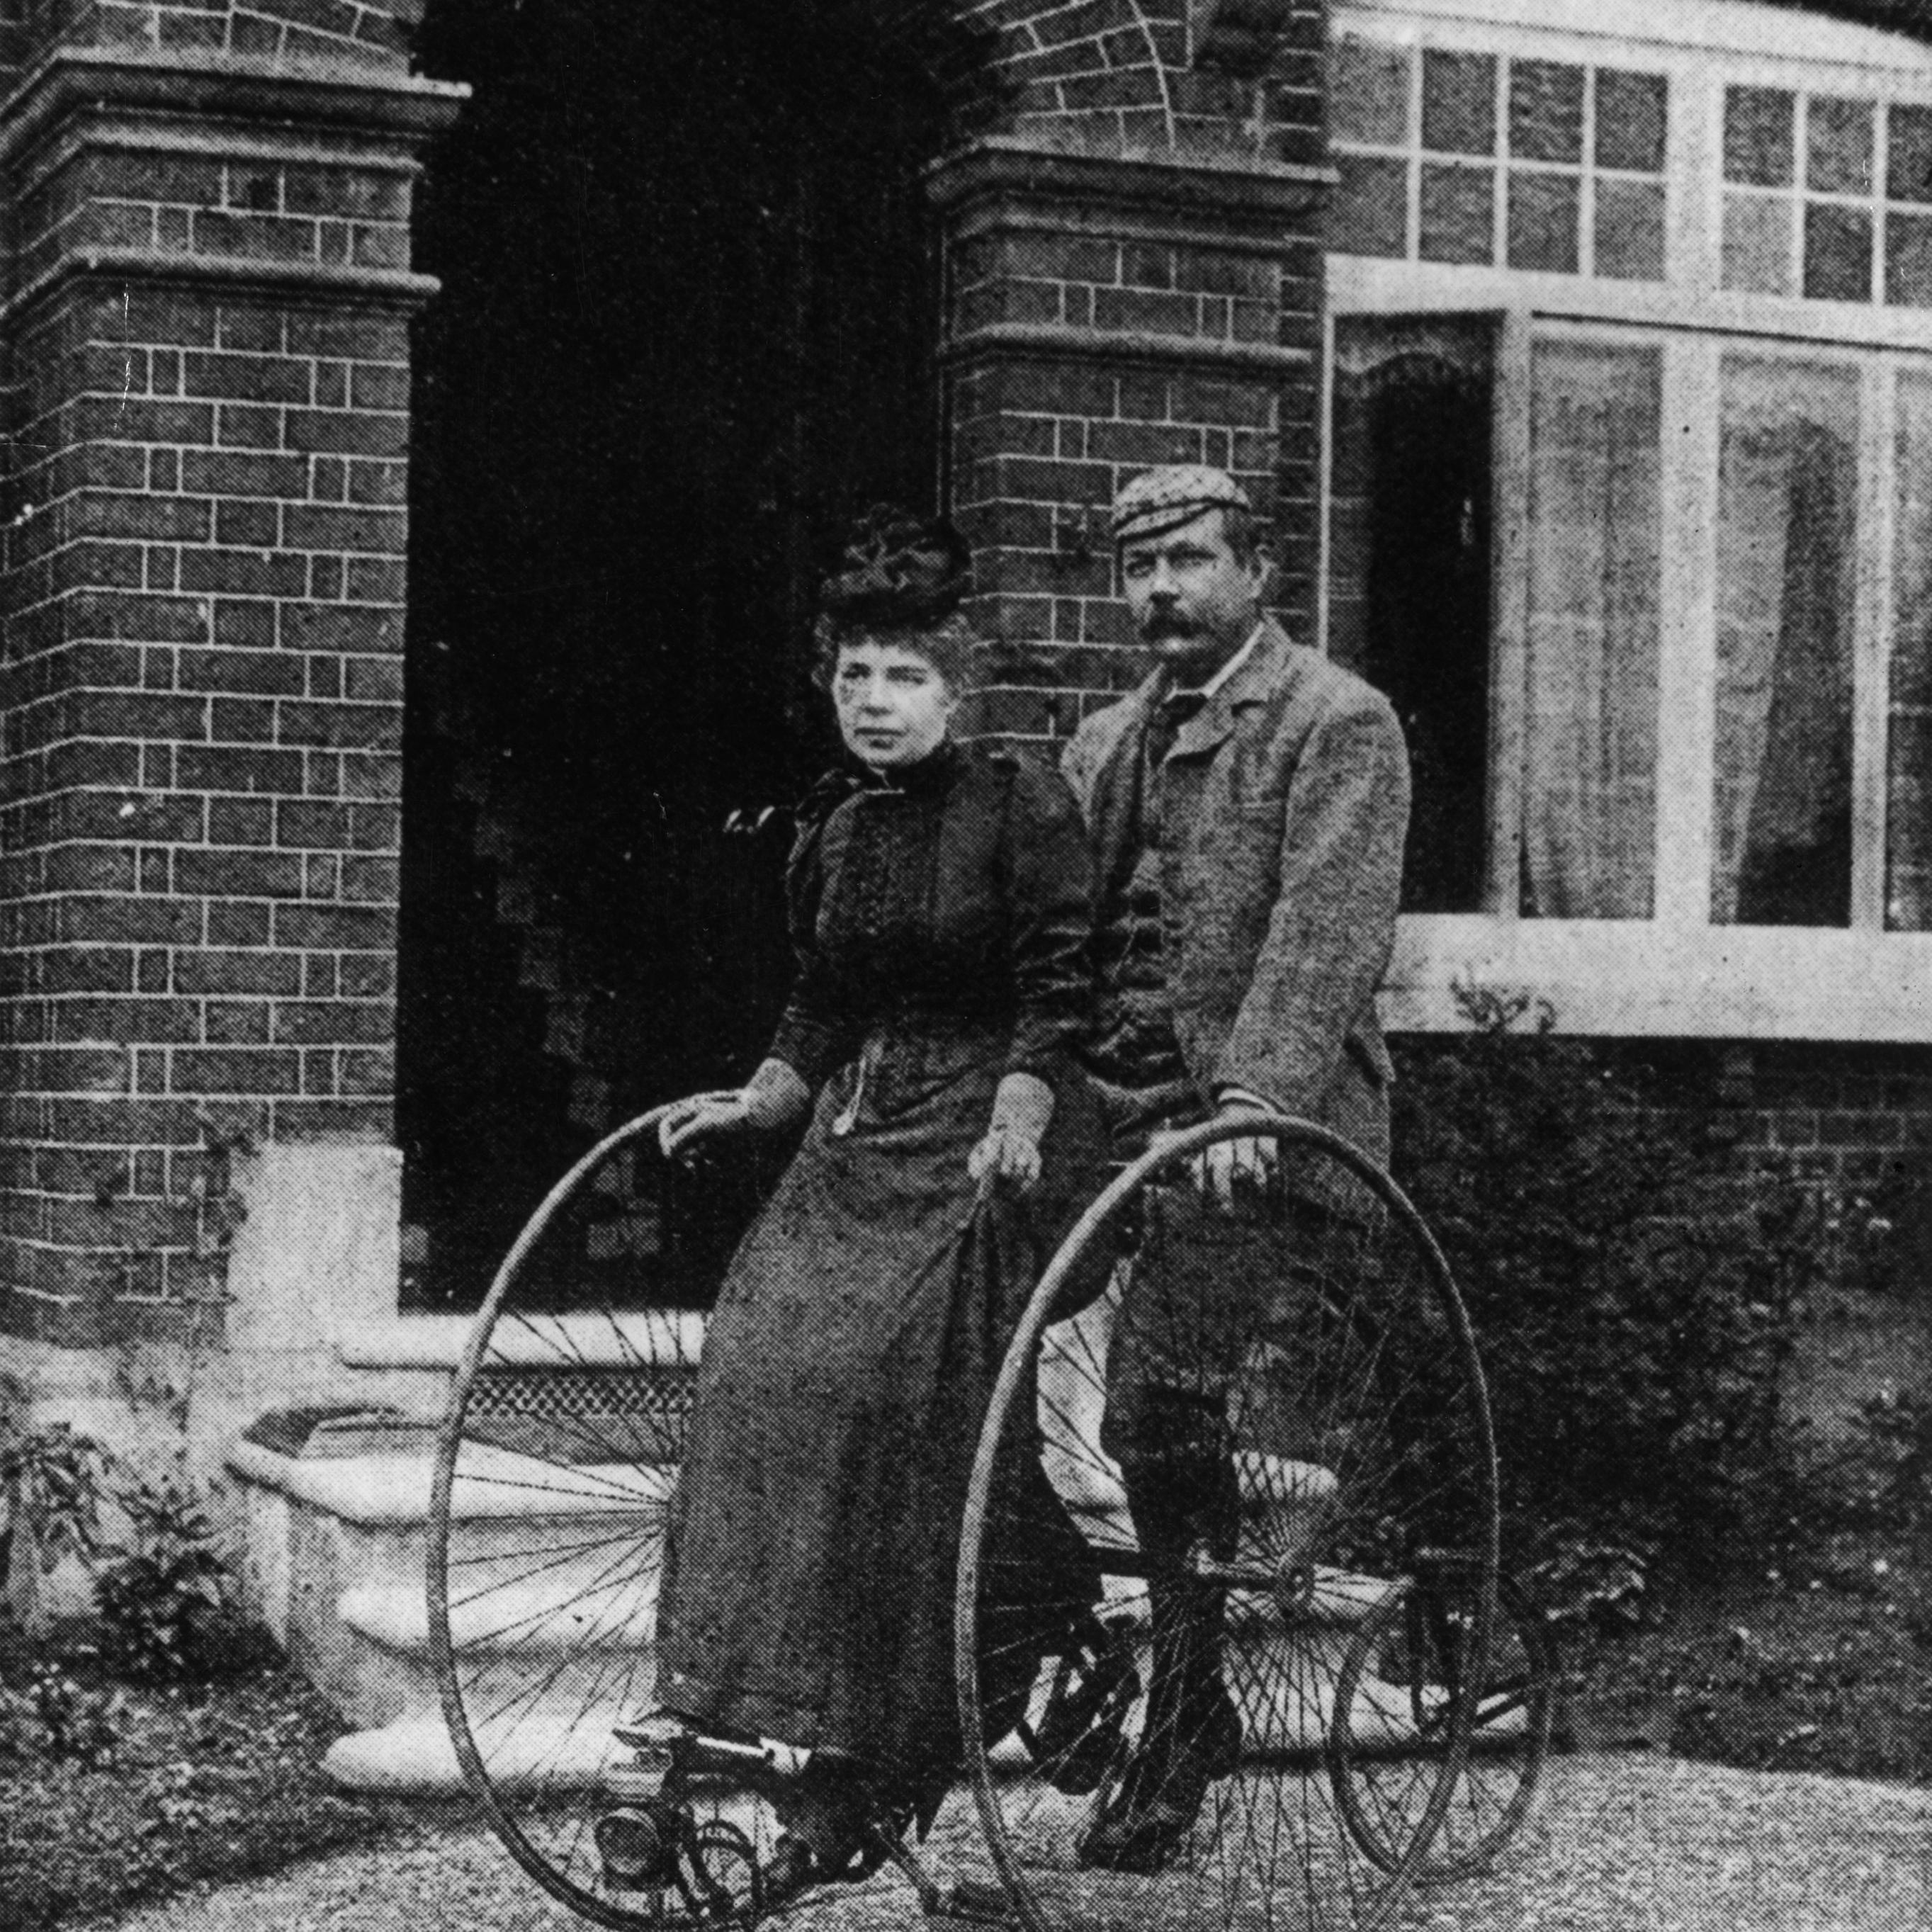 Arthur Conan Doyle and wife on tandem bike